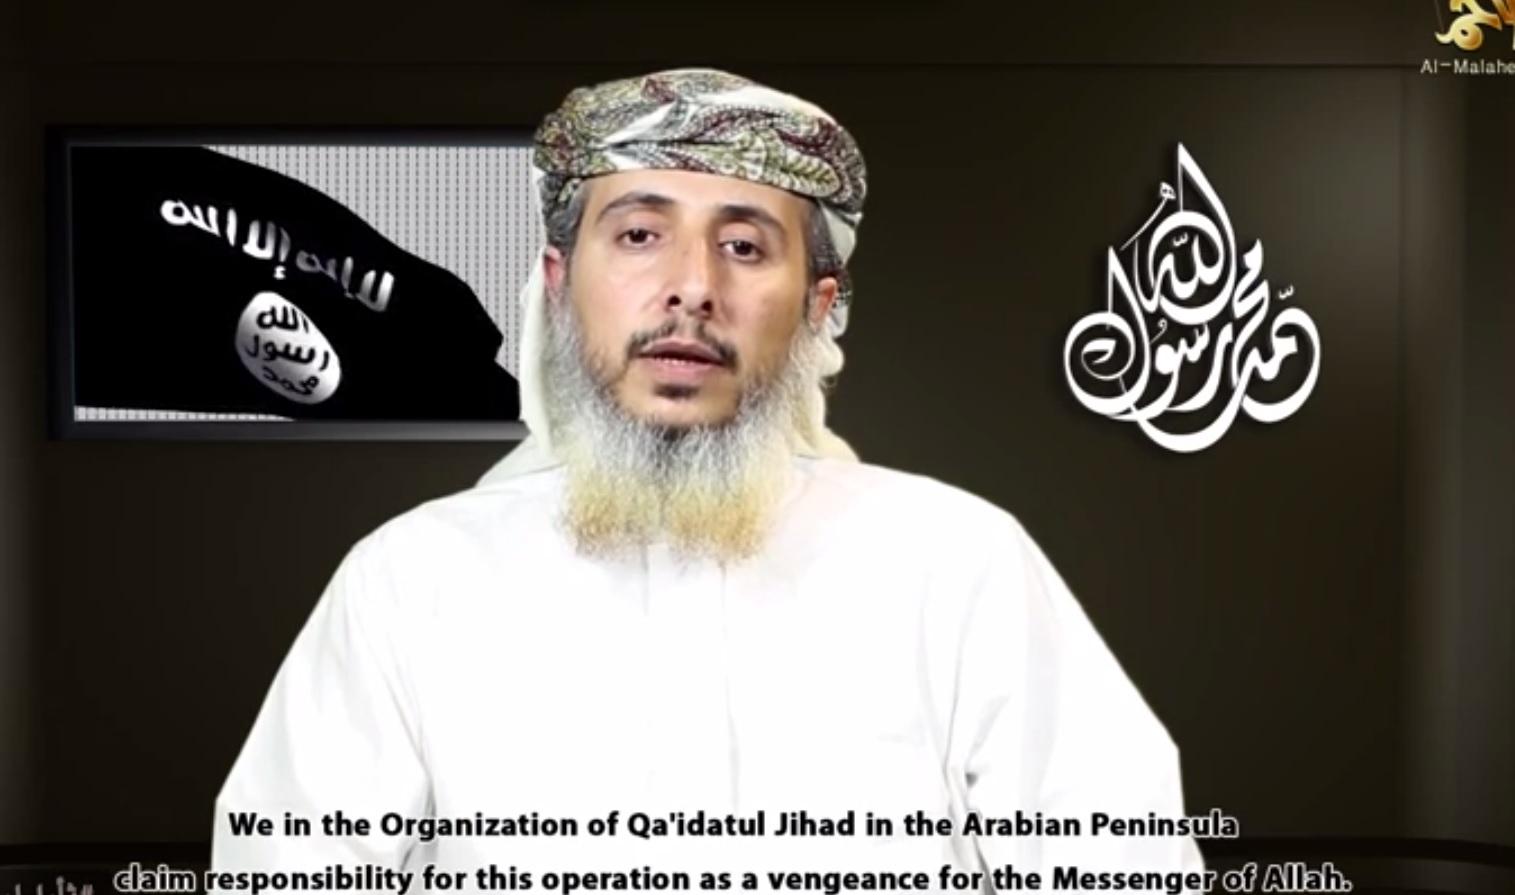 Al-Qaeda in Yemen leader al-Ansi claims responsibility for Paris attacks